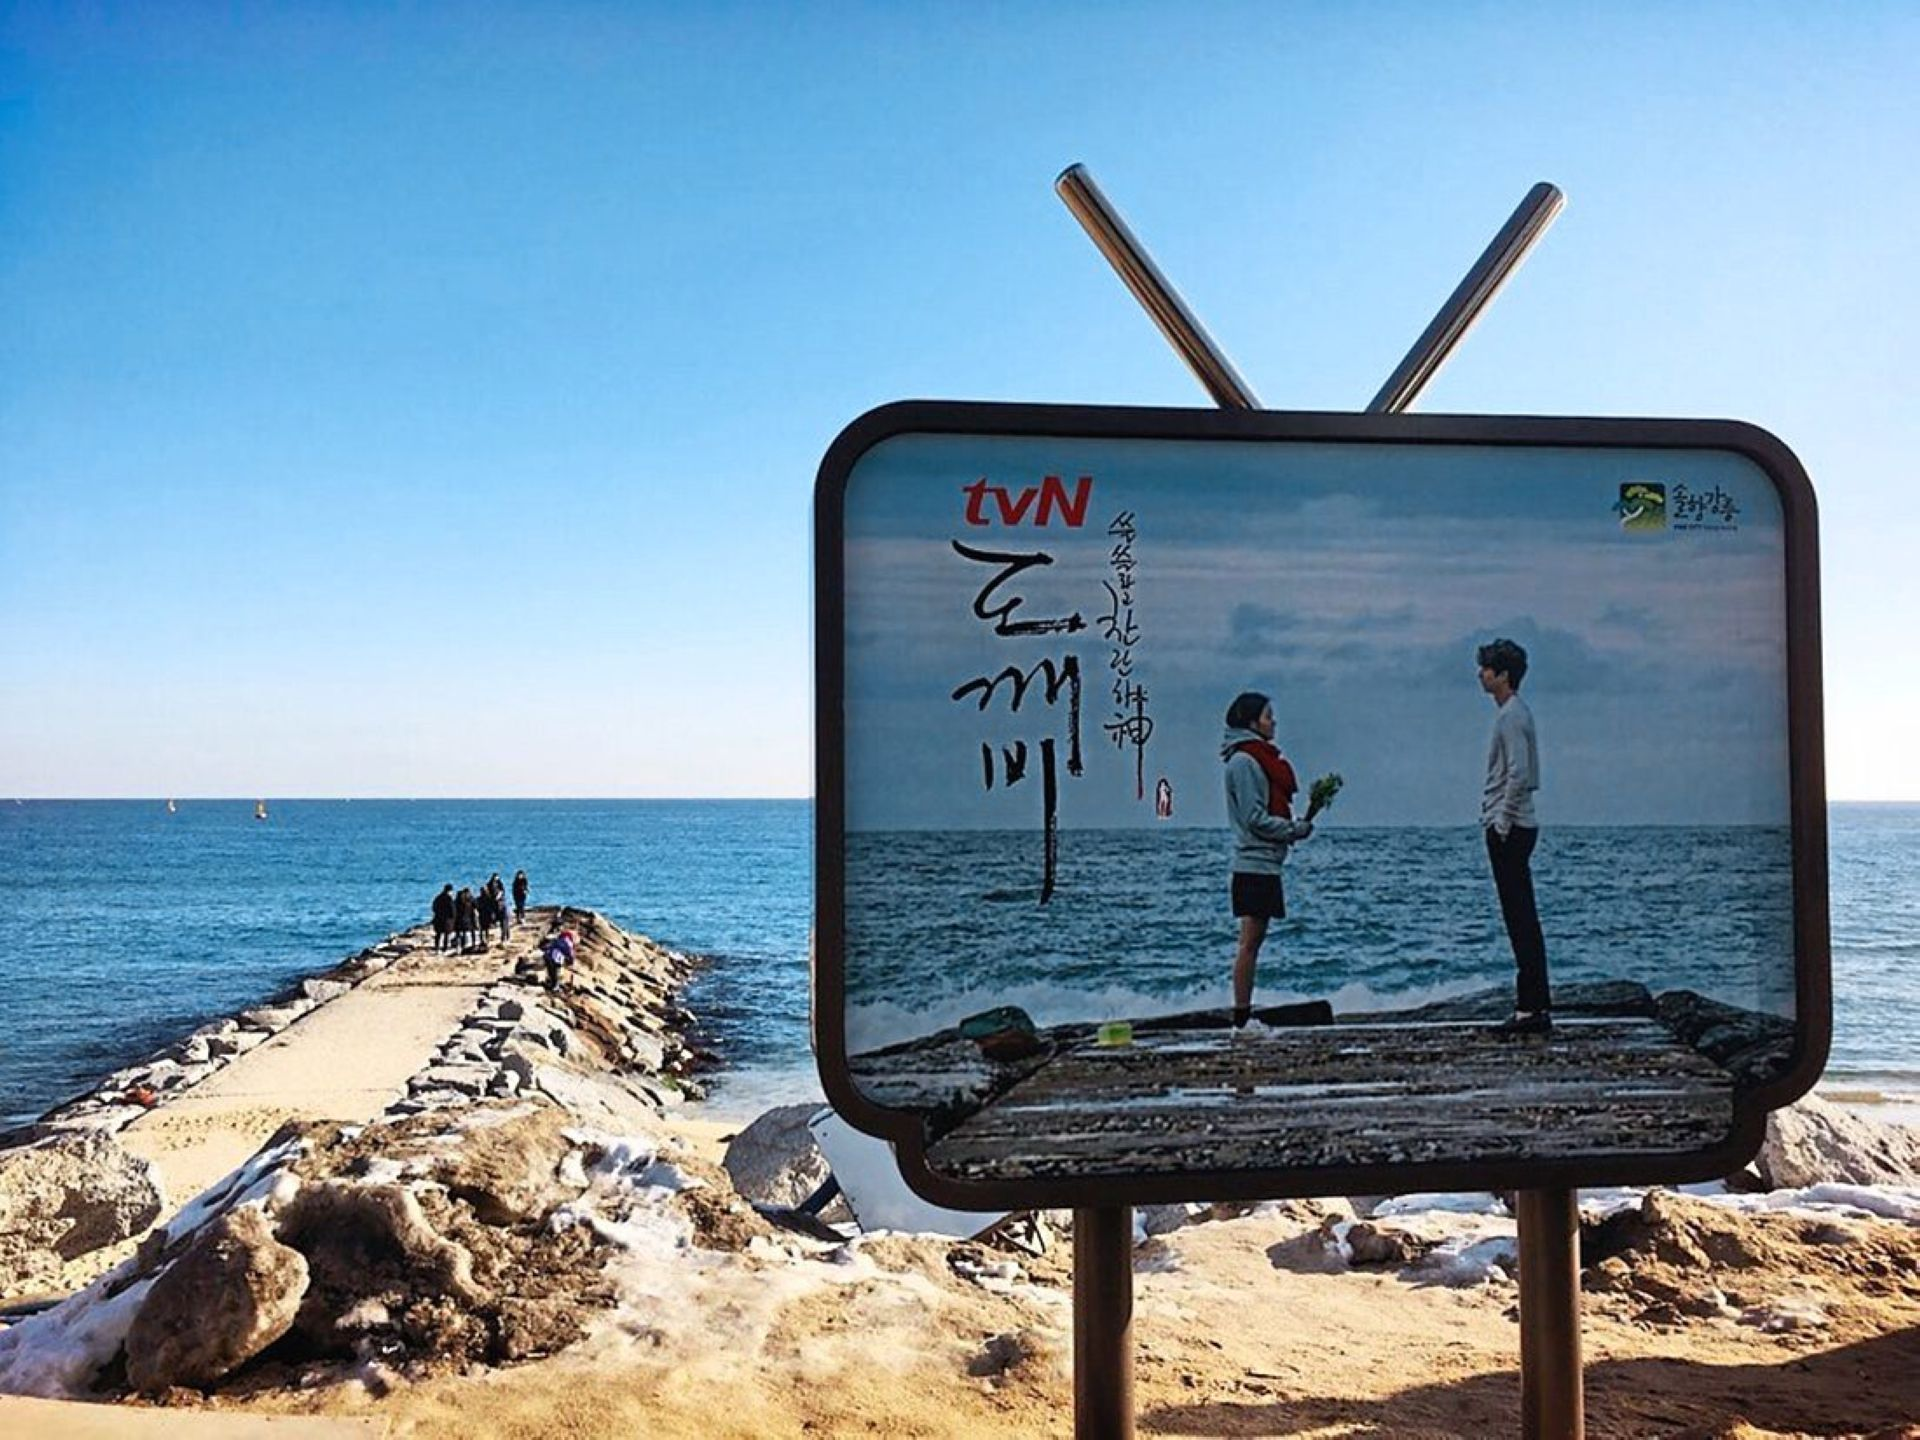 Jumunjin Beach in Gangneung was where the K-Drama 'Goblin' was shot. — Gangwon Province